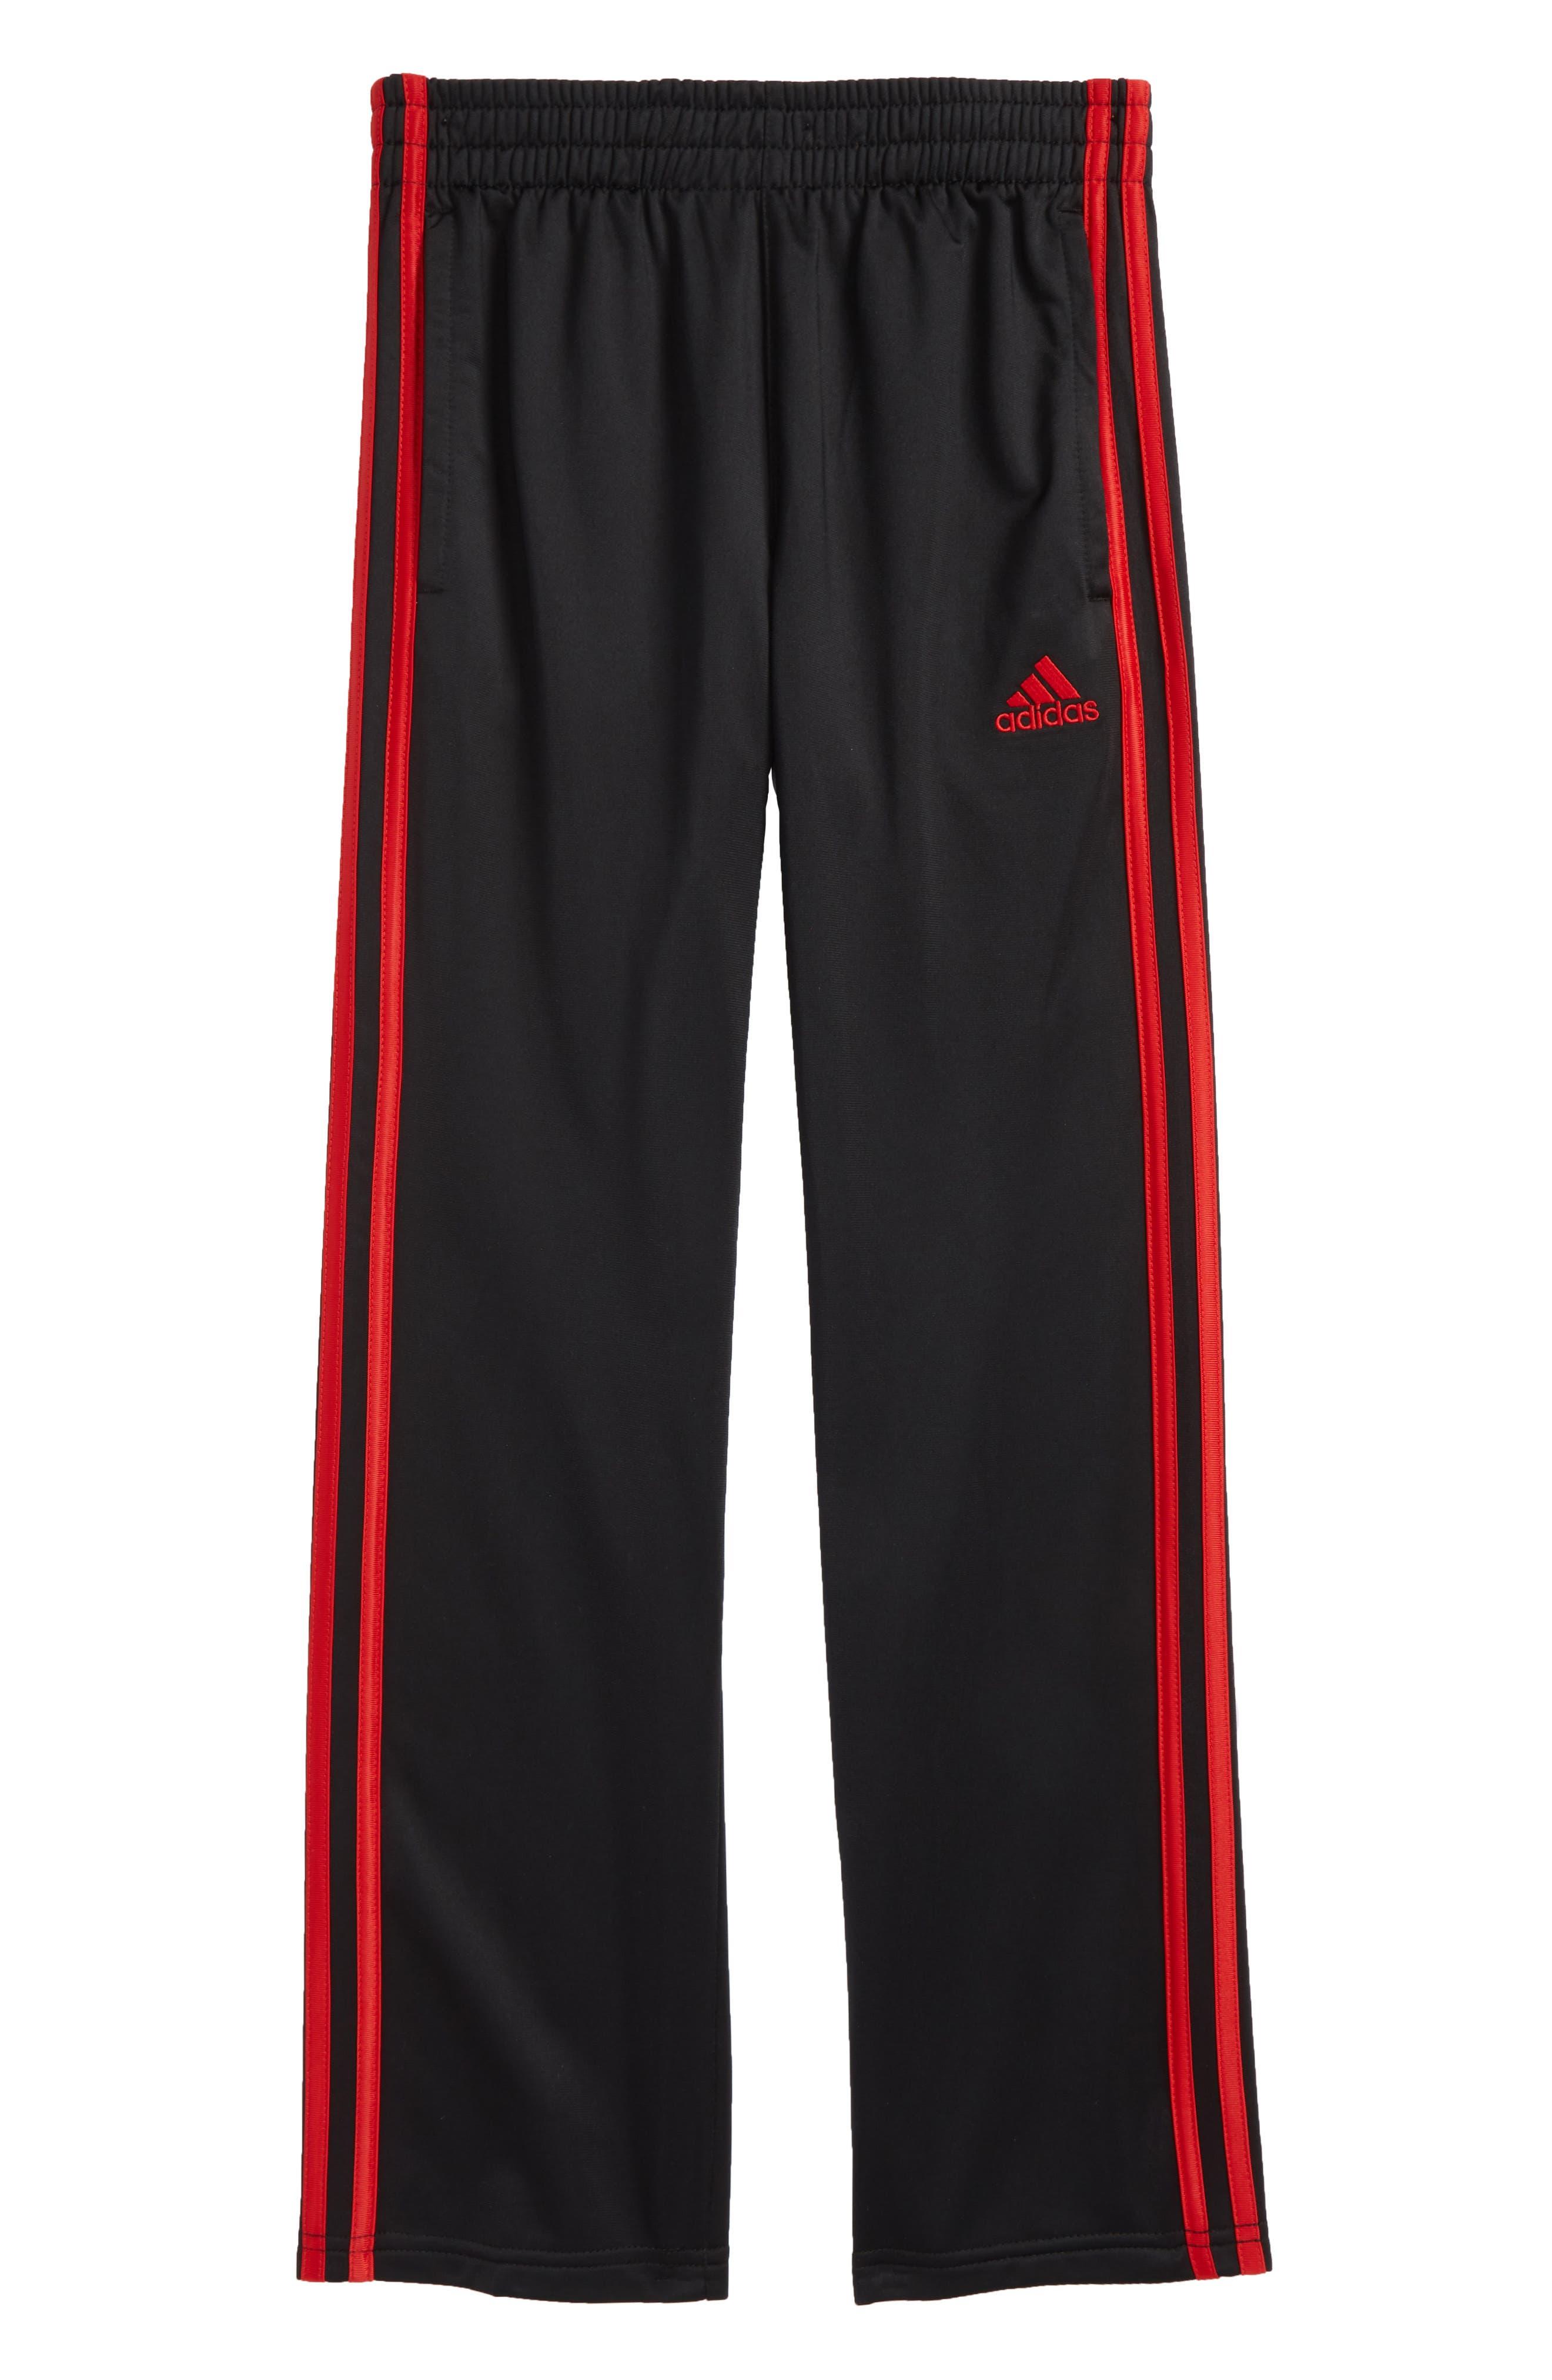 Replenishment Iconic Pants,                         Main,                         color, 005